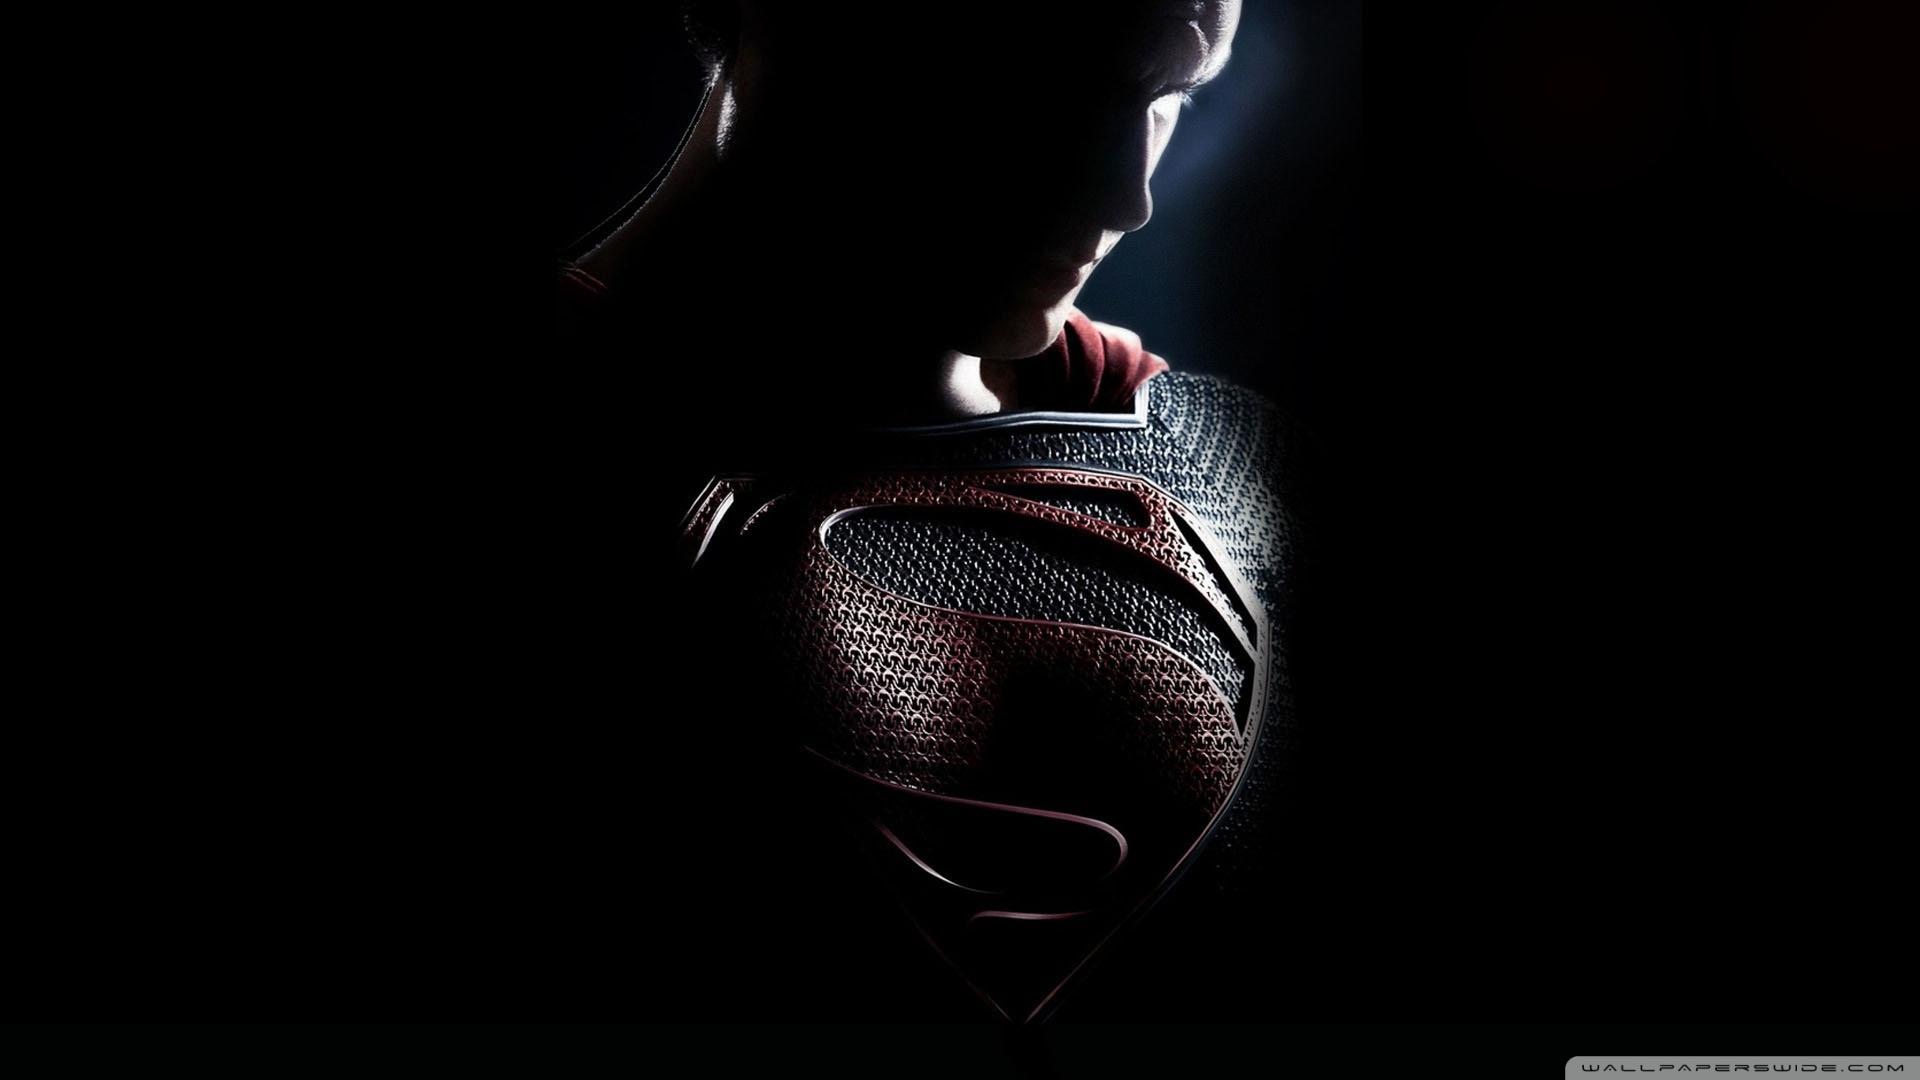 Man Of Steel 2013 Superman Wallpaper 1920x1080 Man Of Steel 2013 1920x1080